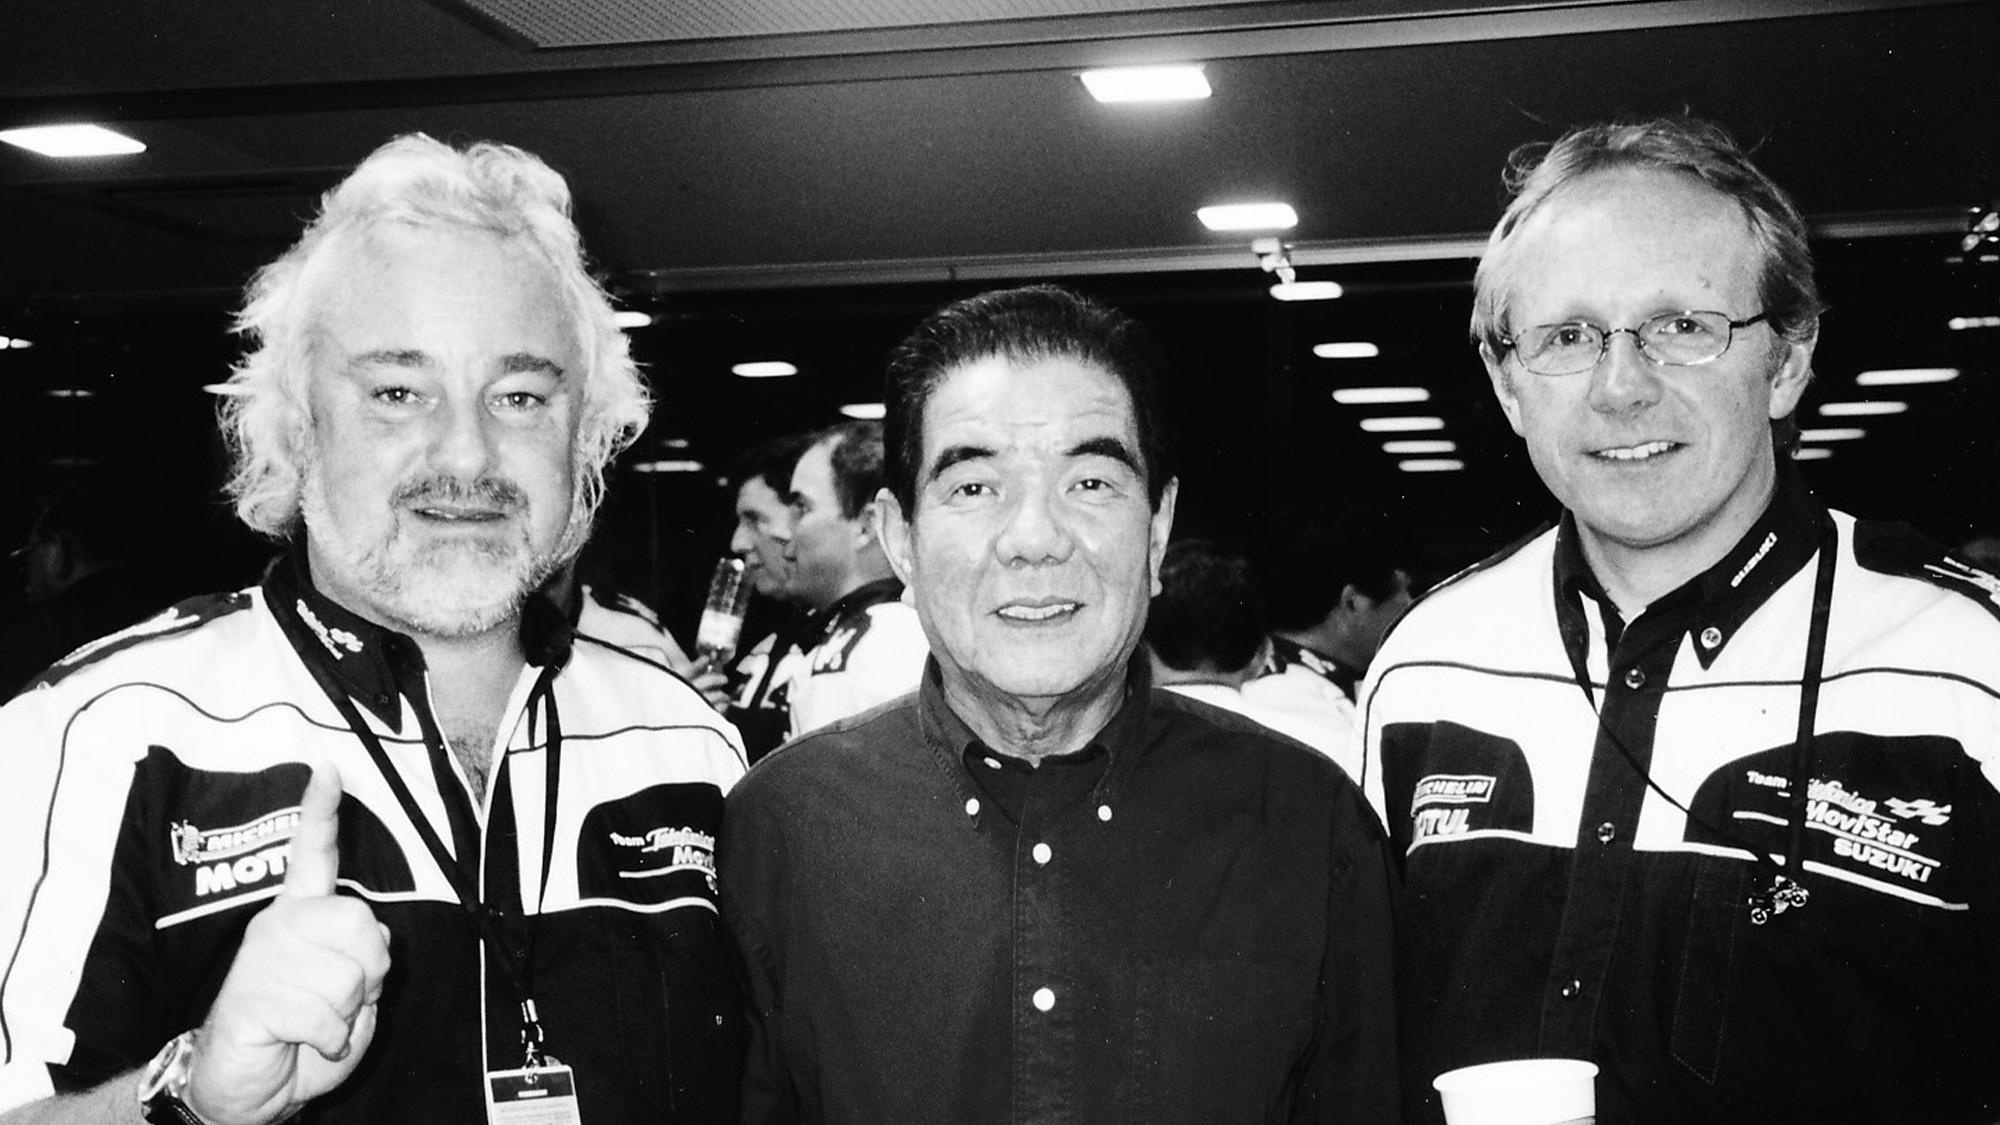 Garry Taylor Mutsuo Itoh and Stuart Shenton